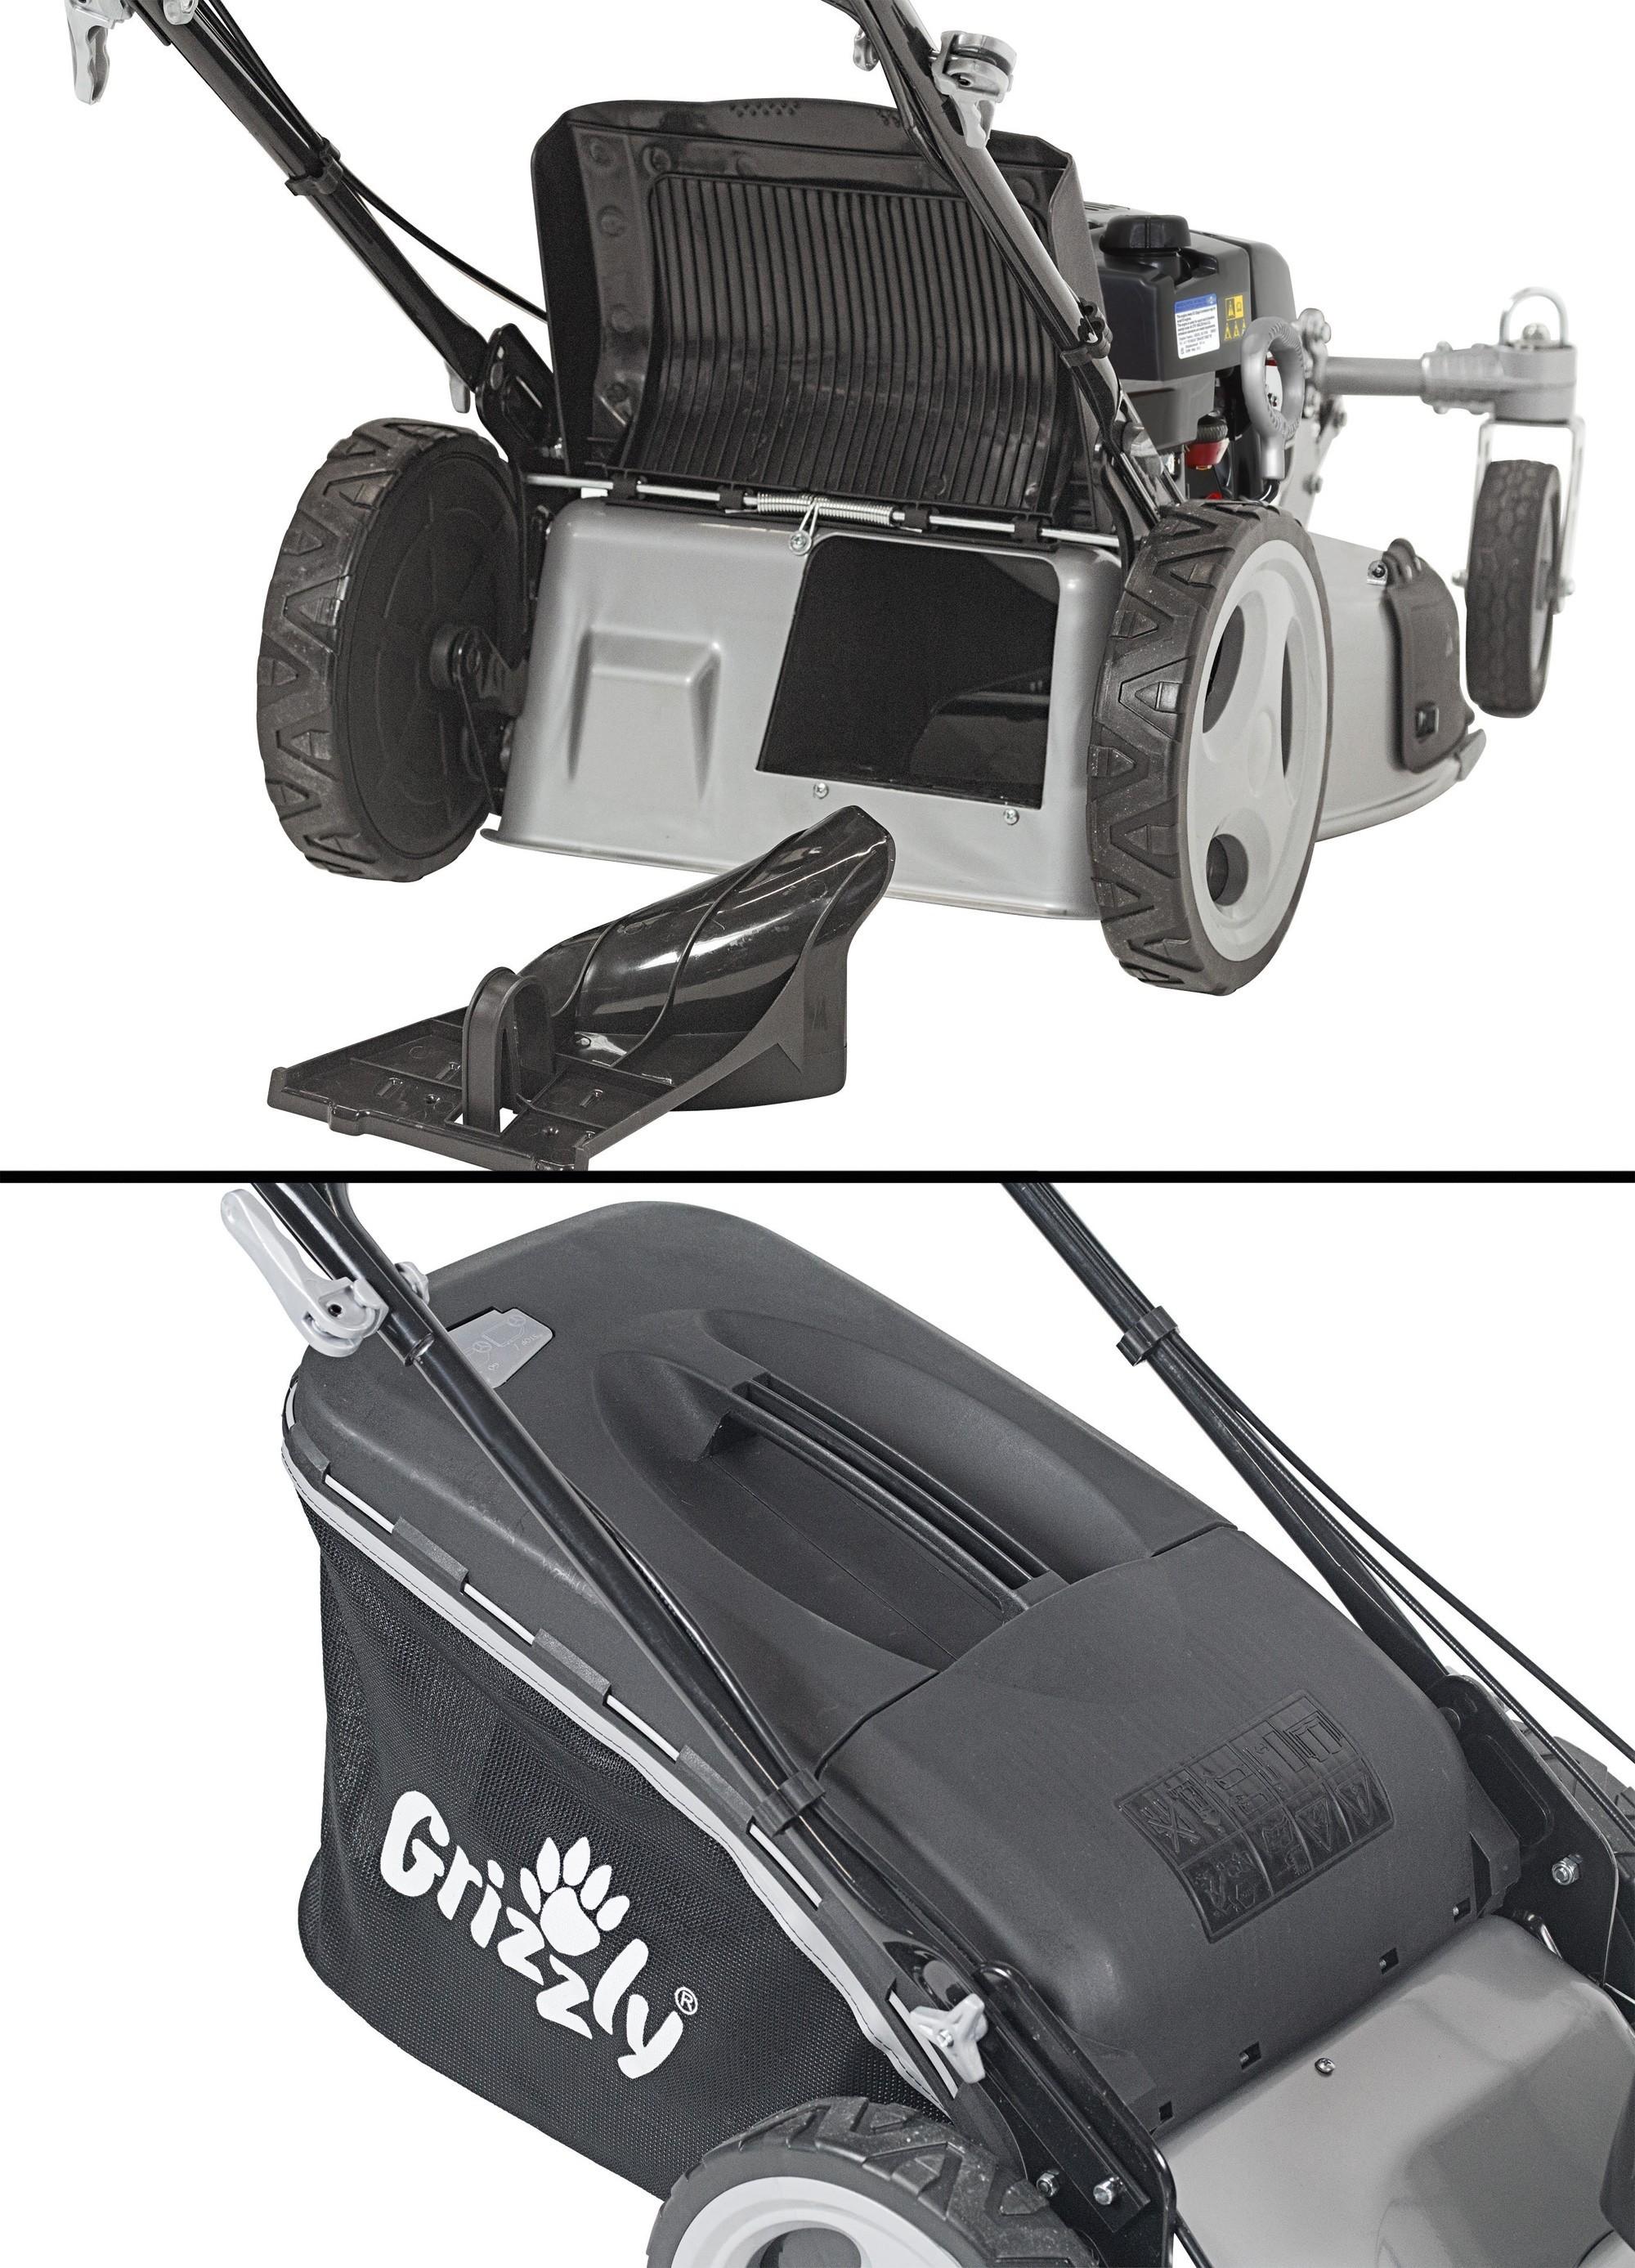 Benzin Rasenmäher Grizzly BRM 56 161 BSA Q 360° B&S Motor 2,61kW 56cm Bild 4